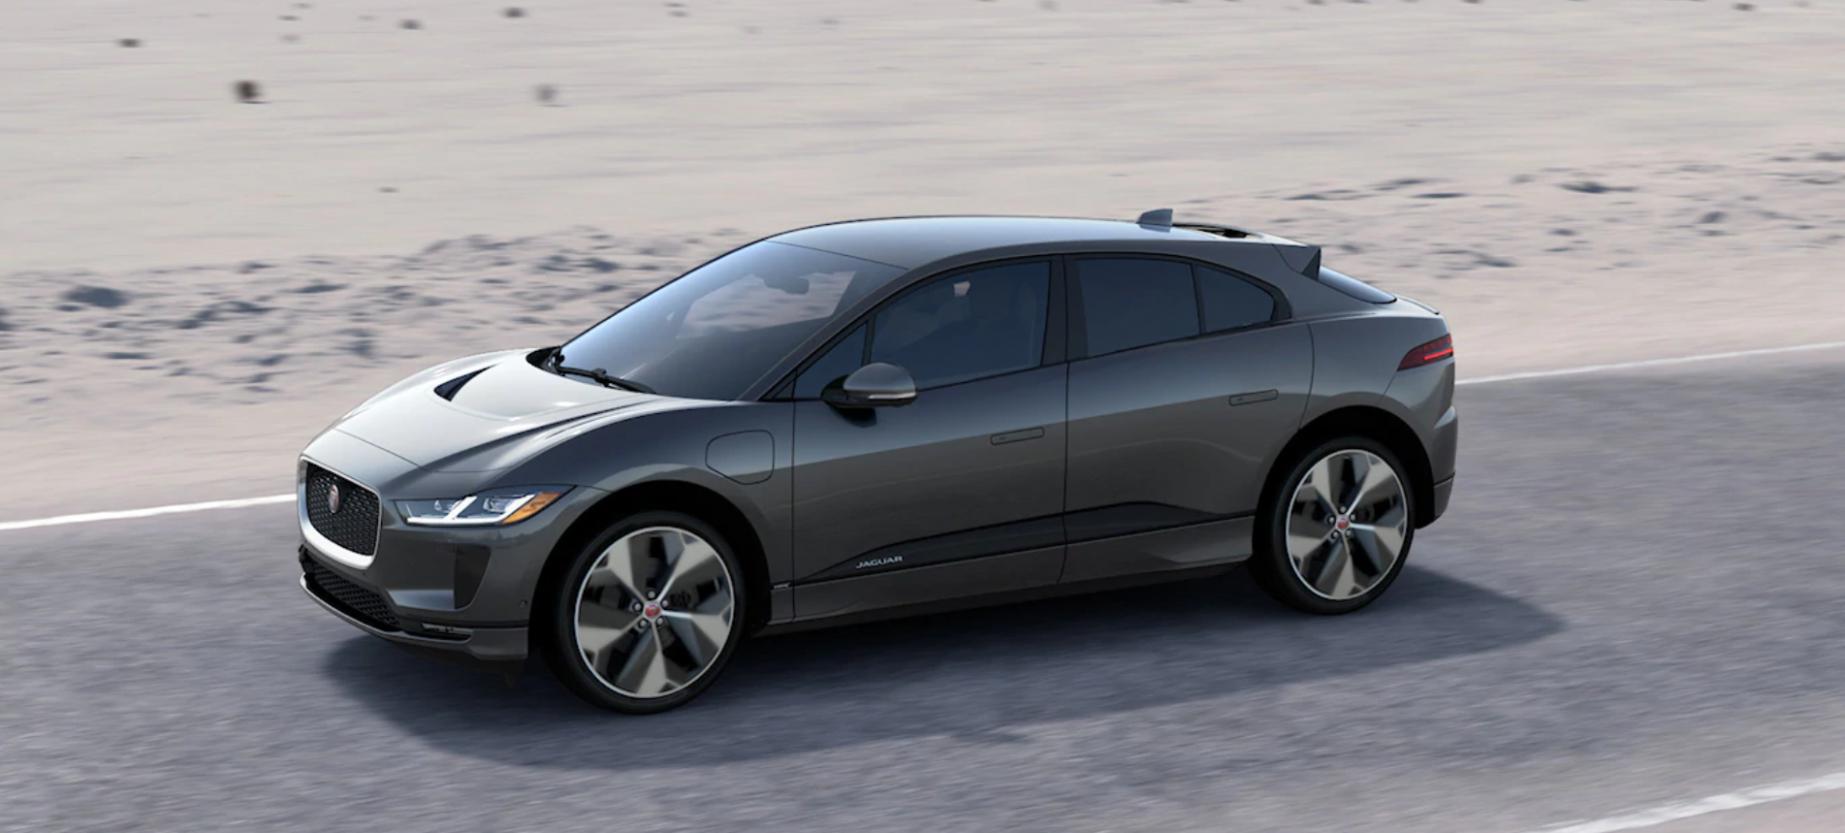 Jaguar I Pace Electric Cars 2020 Release Electric Cars Jaguar Living In Car